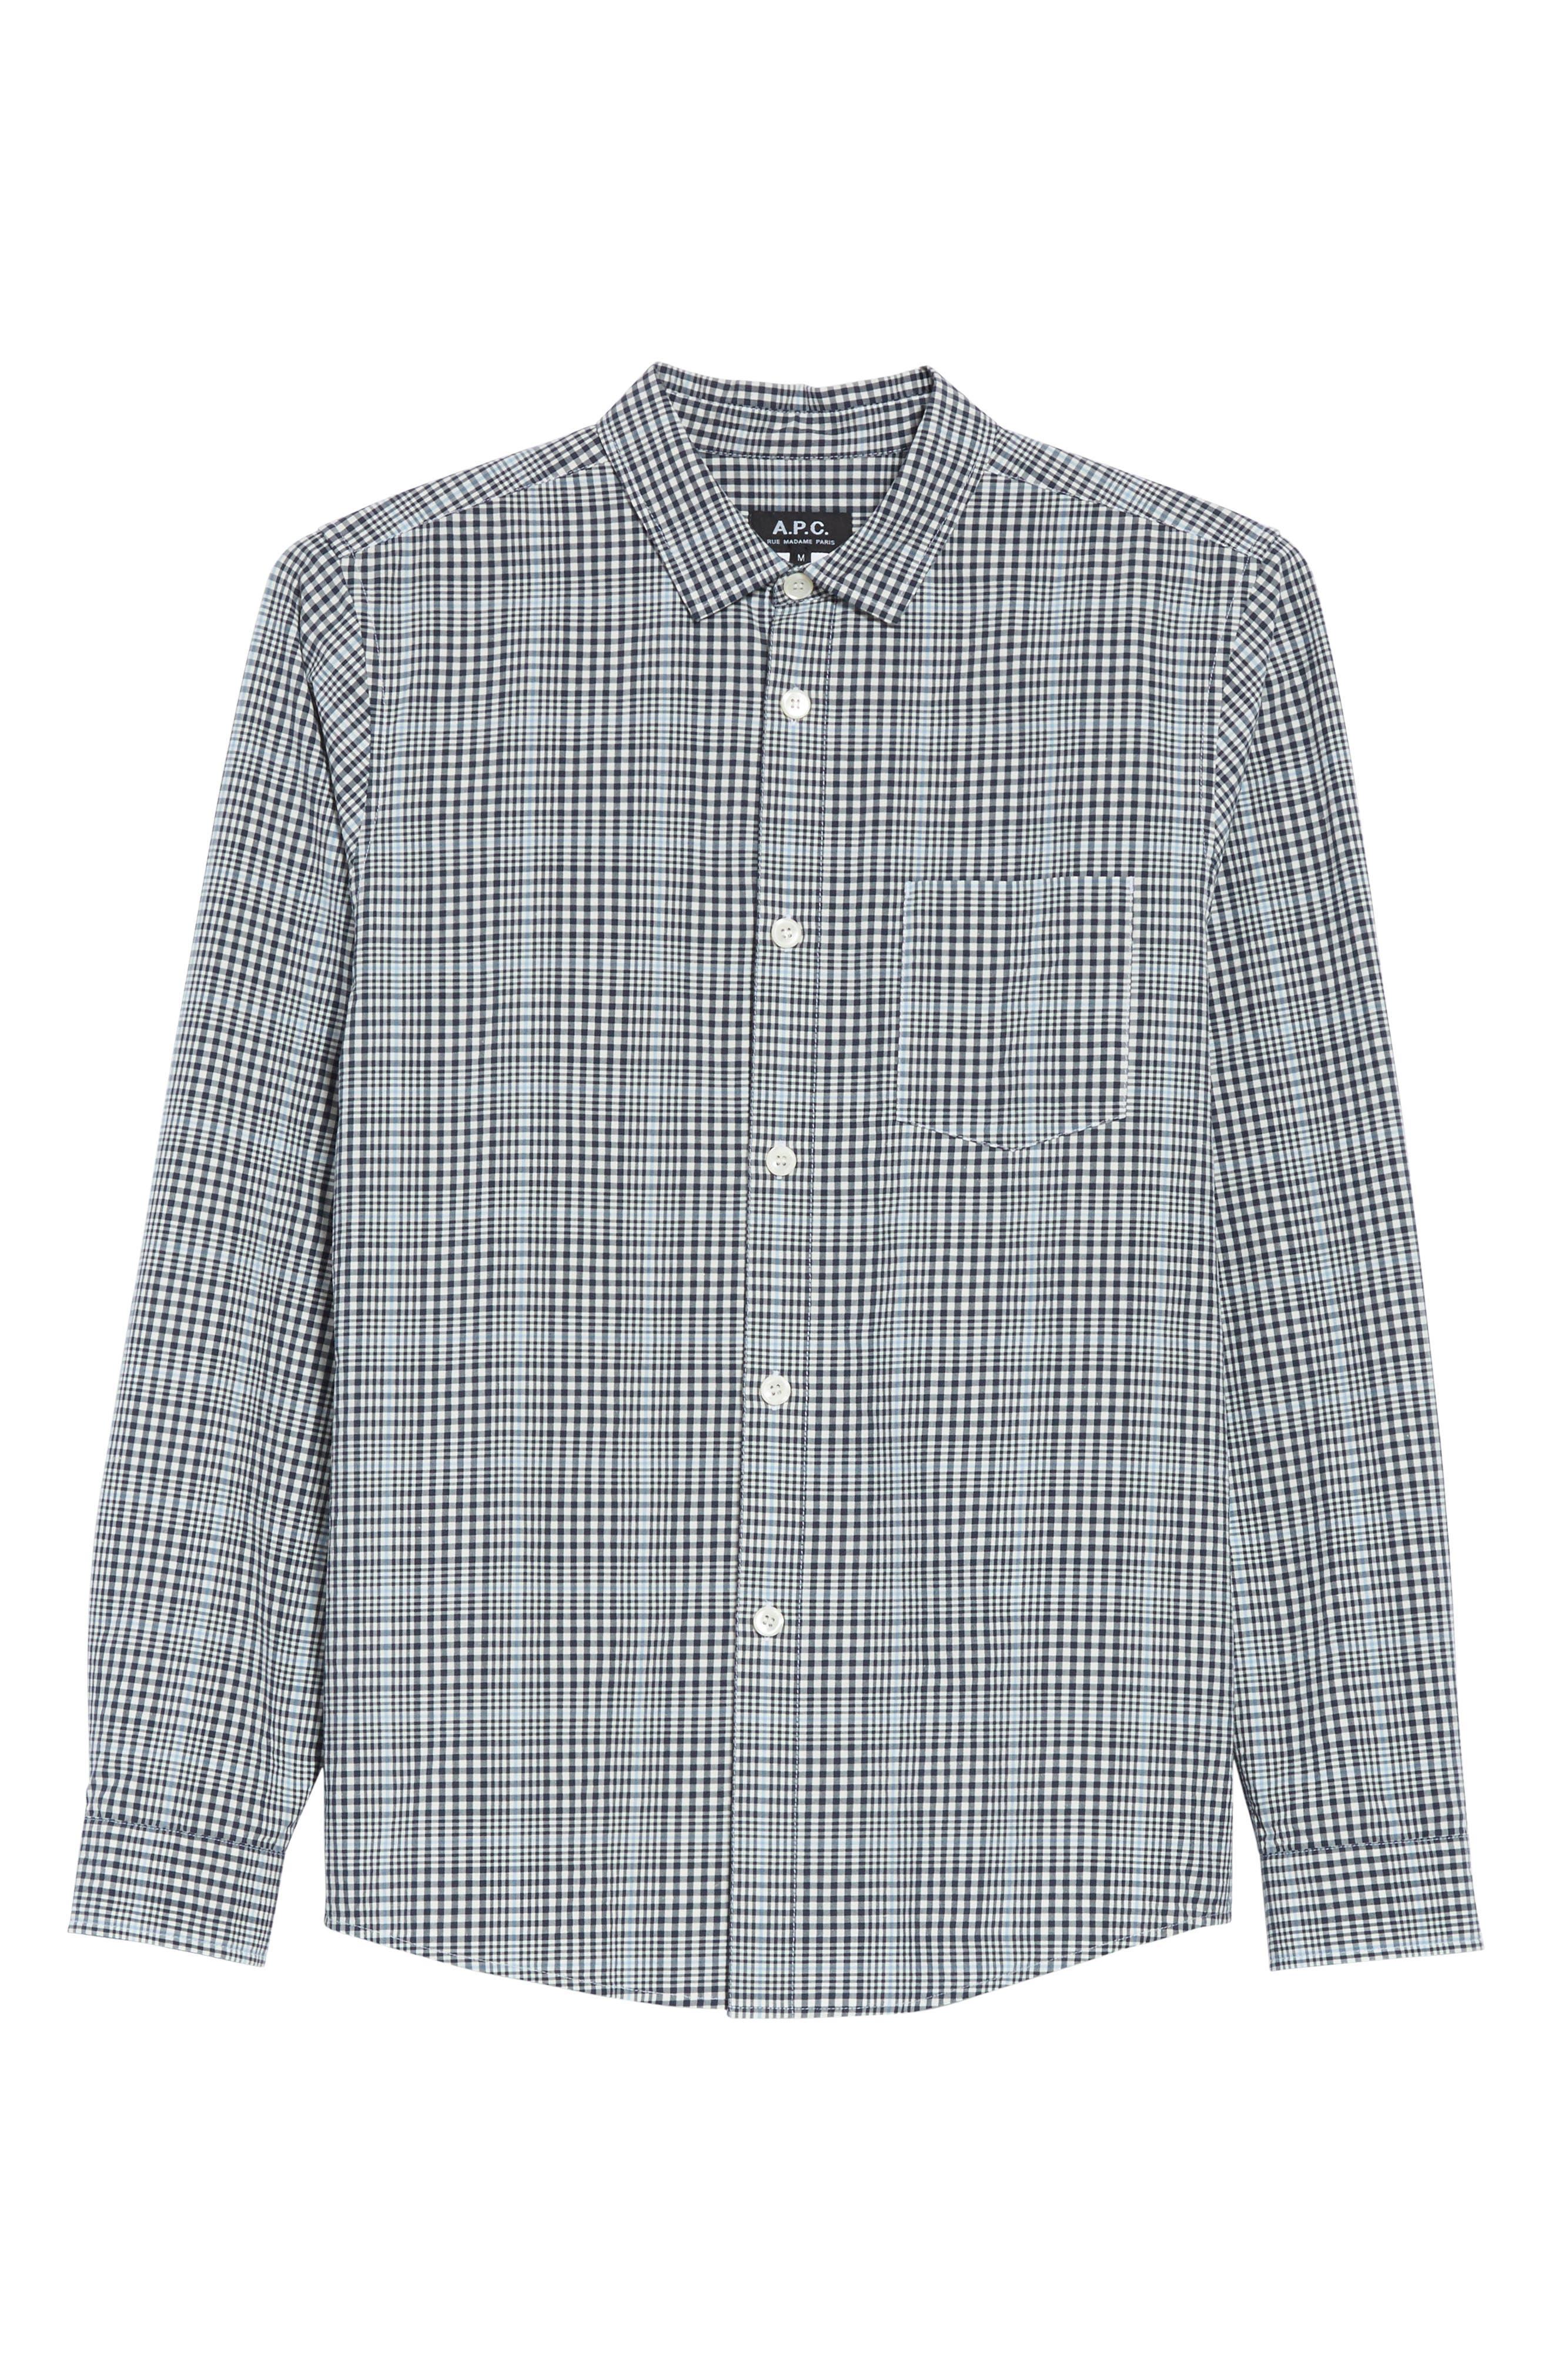 Alternate Image 6  - A.P.C. John Check Woven Shirt